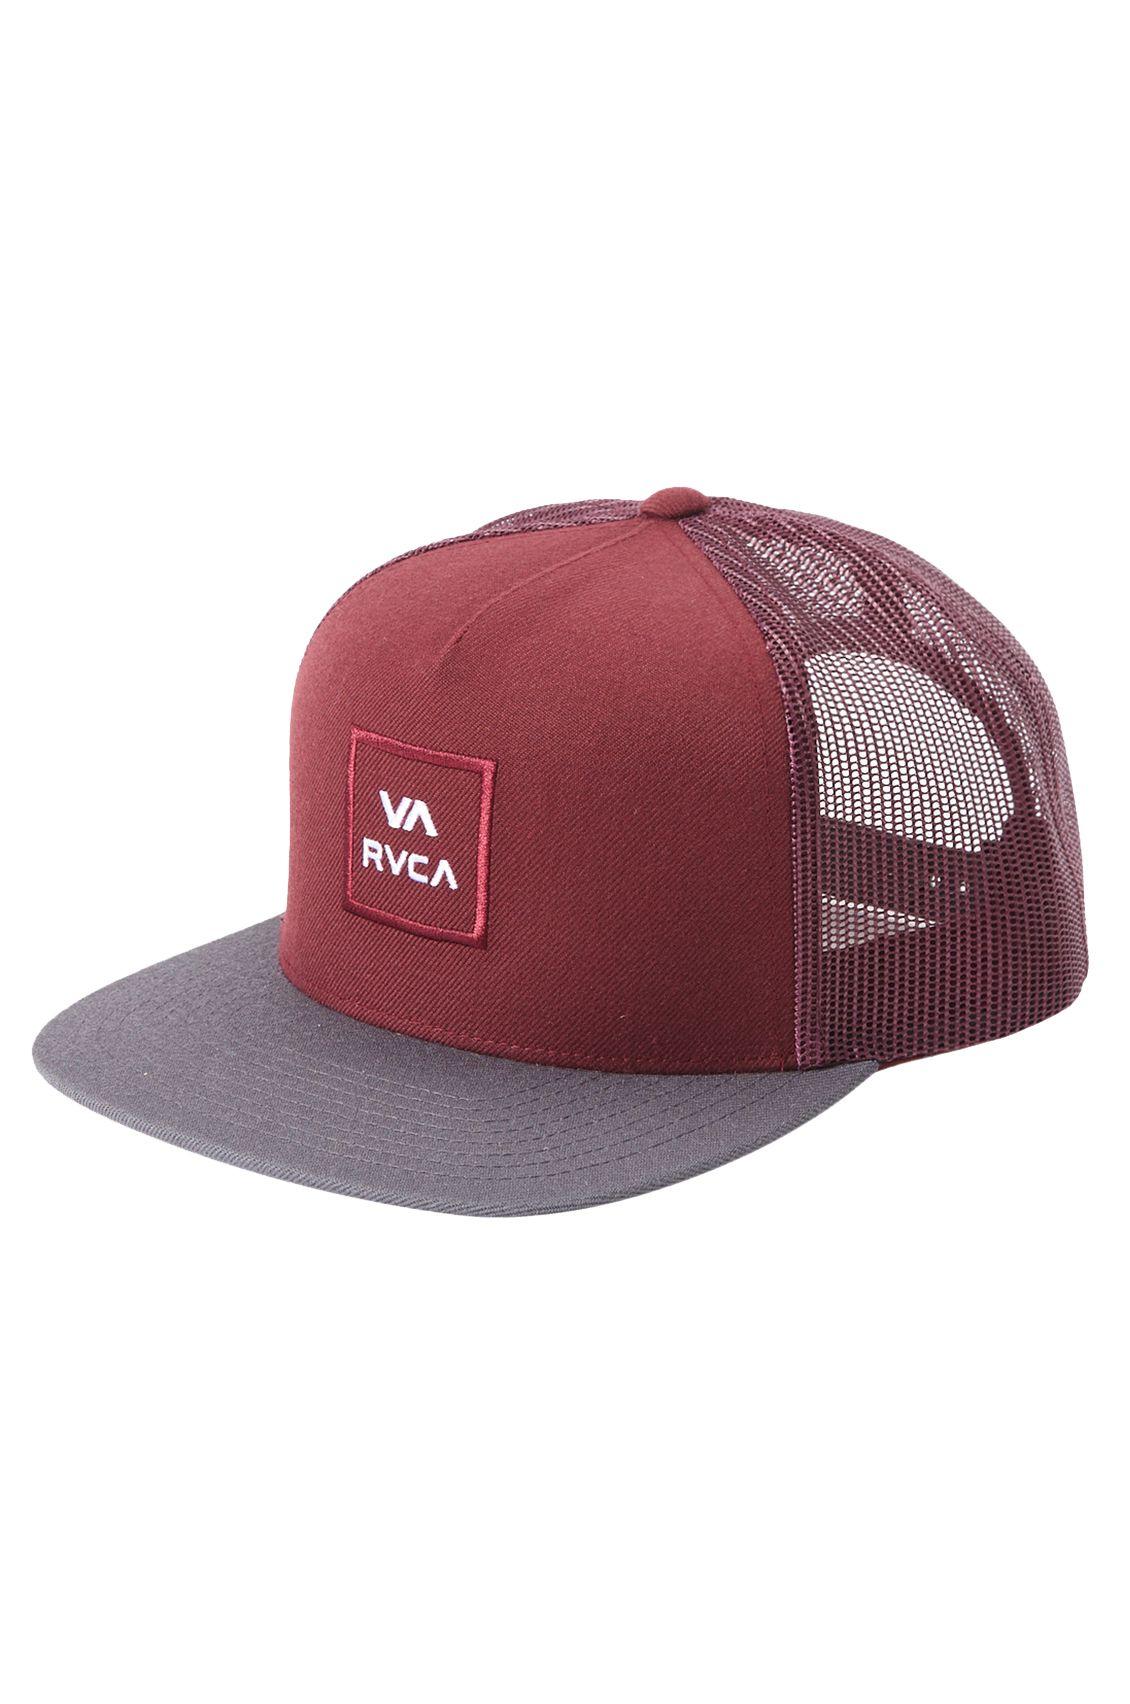 RVCA Cap   VA ALL THE WAY TRUCK Oxblood Red